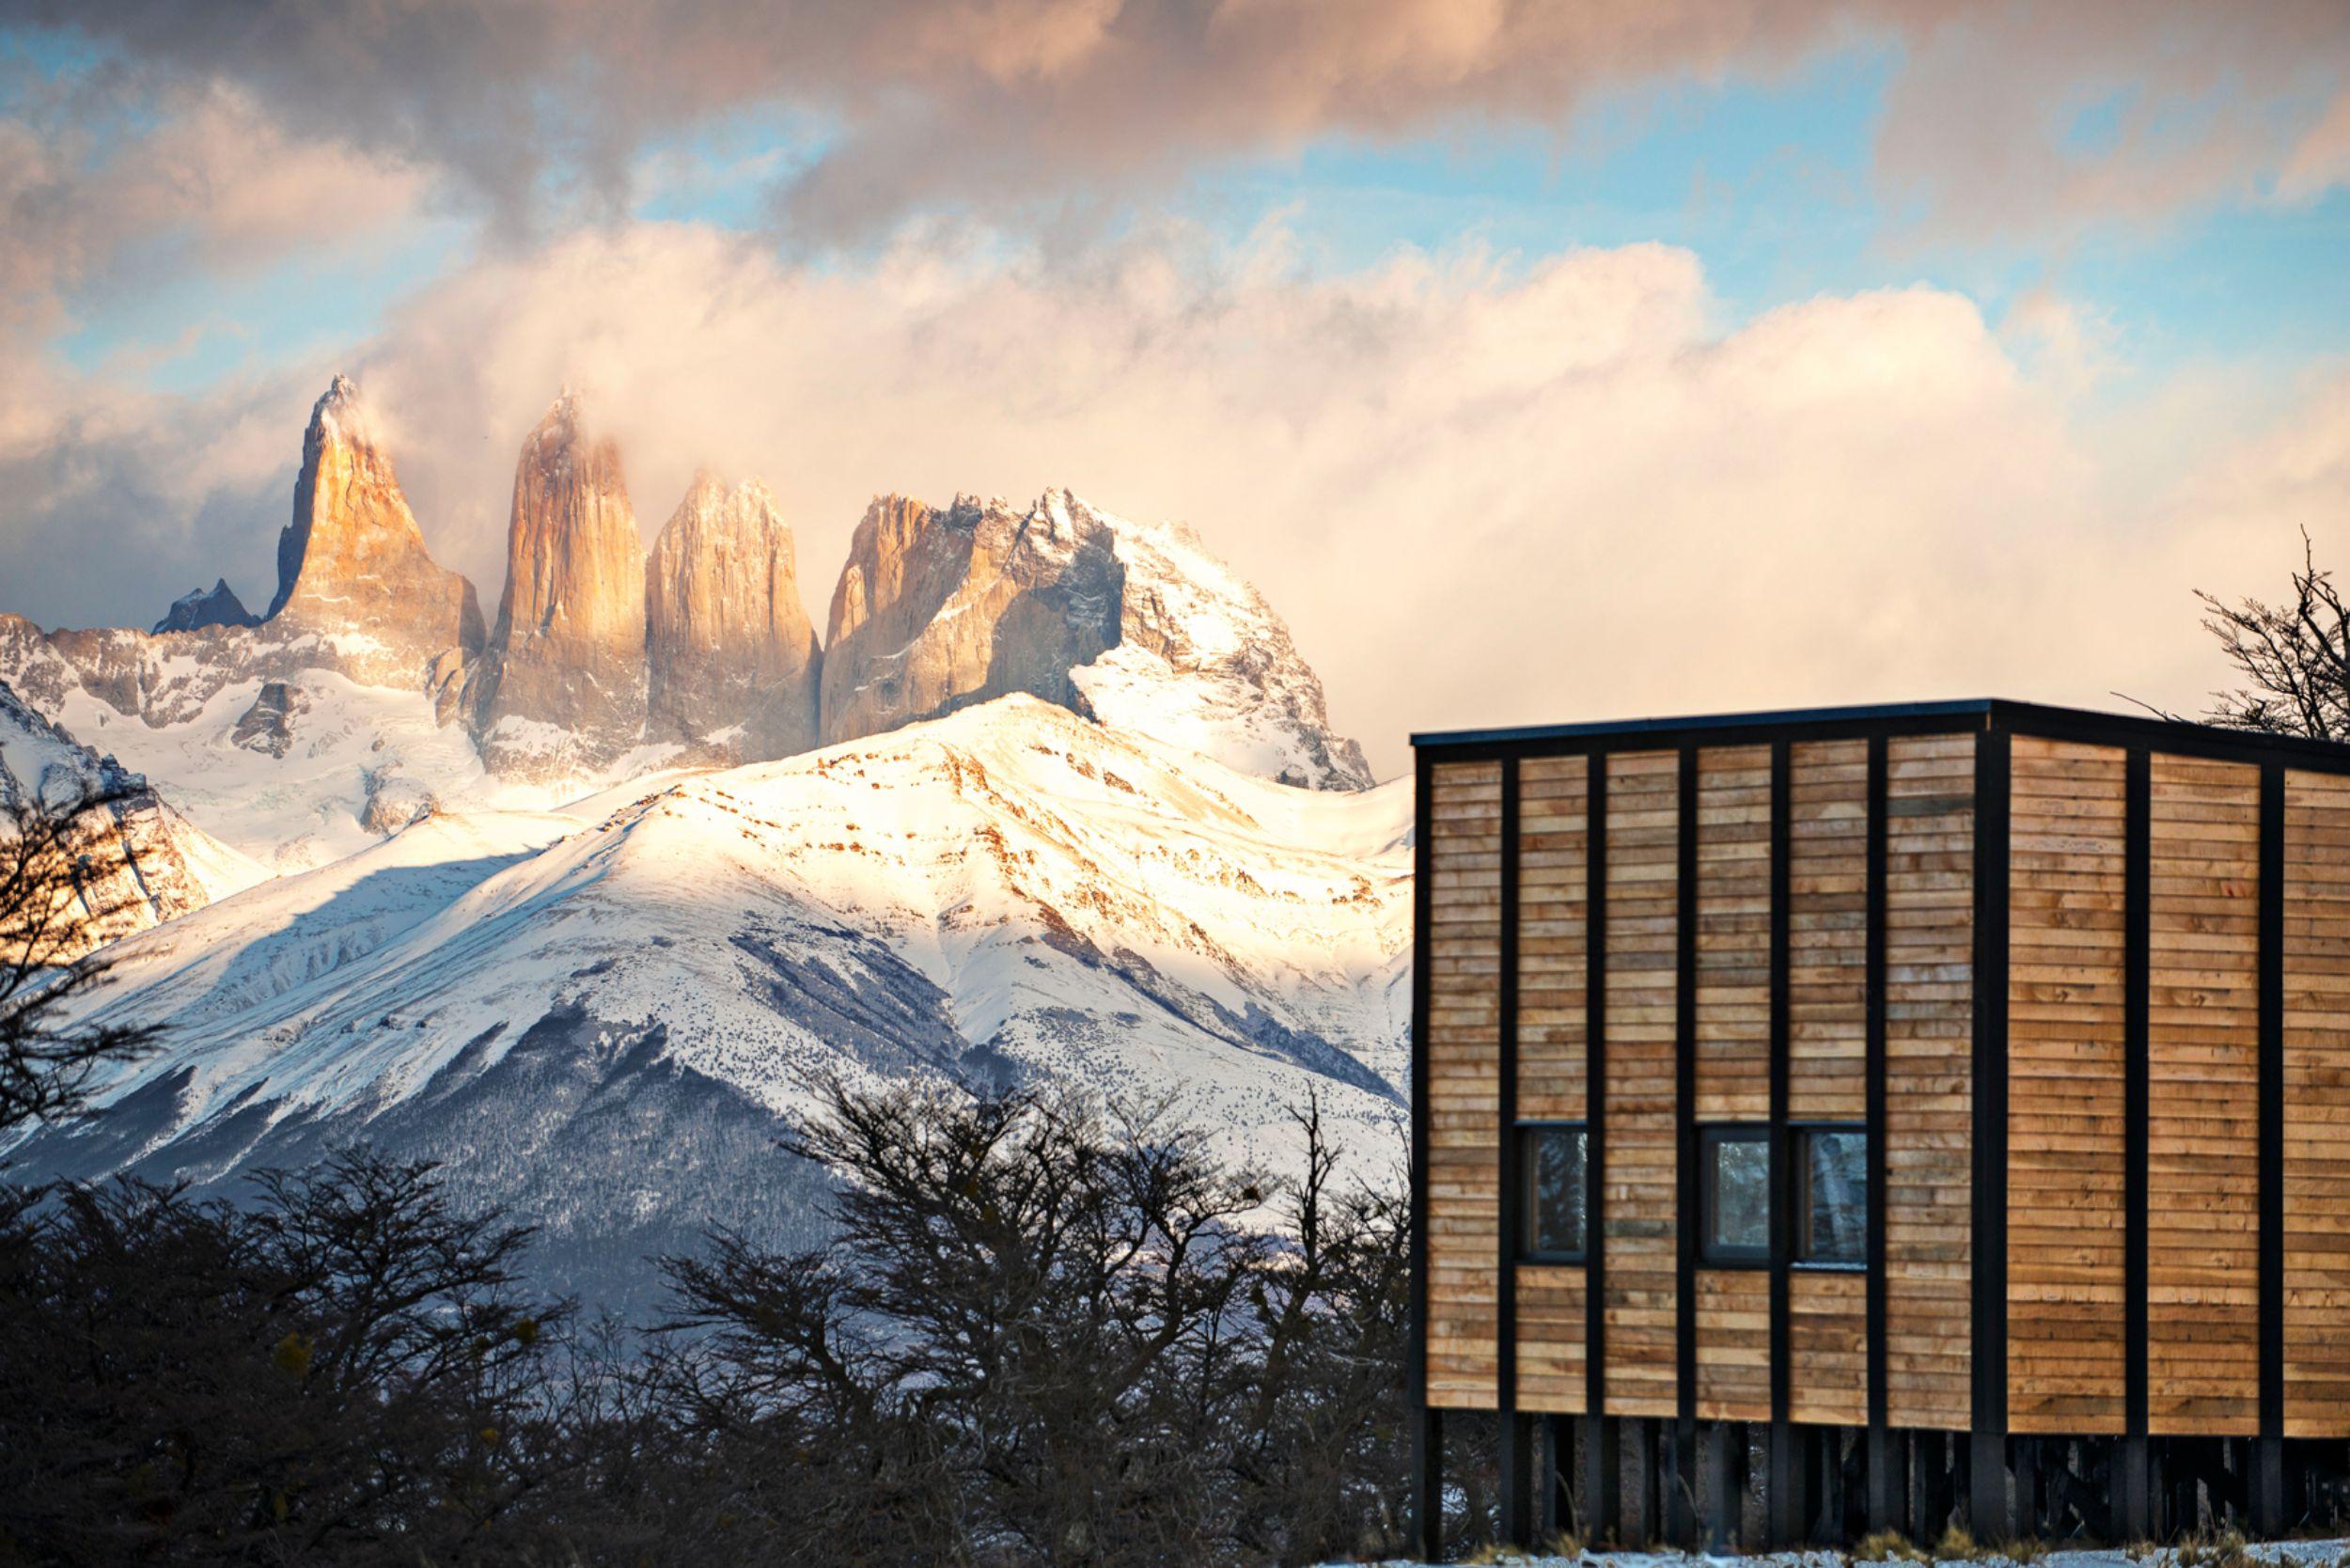 Villas+Exteriors+Awasi+Patagonia+(11).jpg